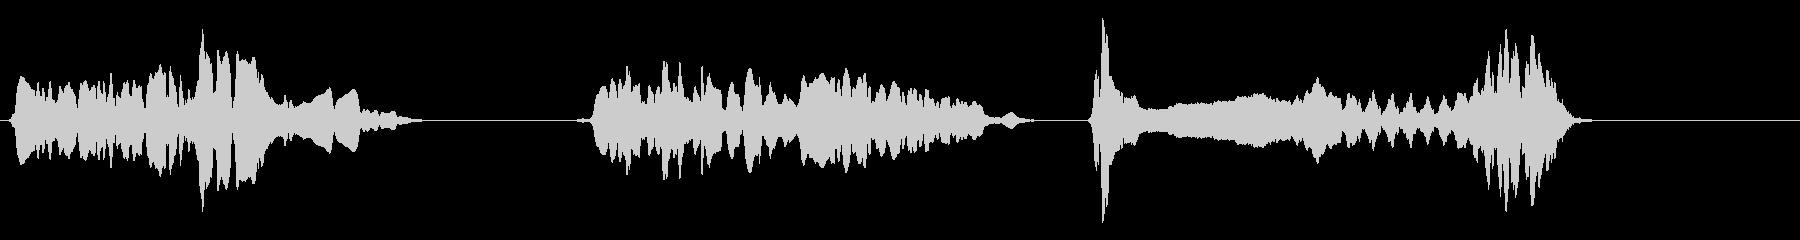 尺八 生演奏 古典風 残響音無 6の未再生の波形